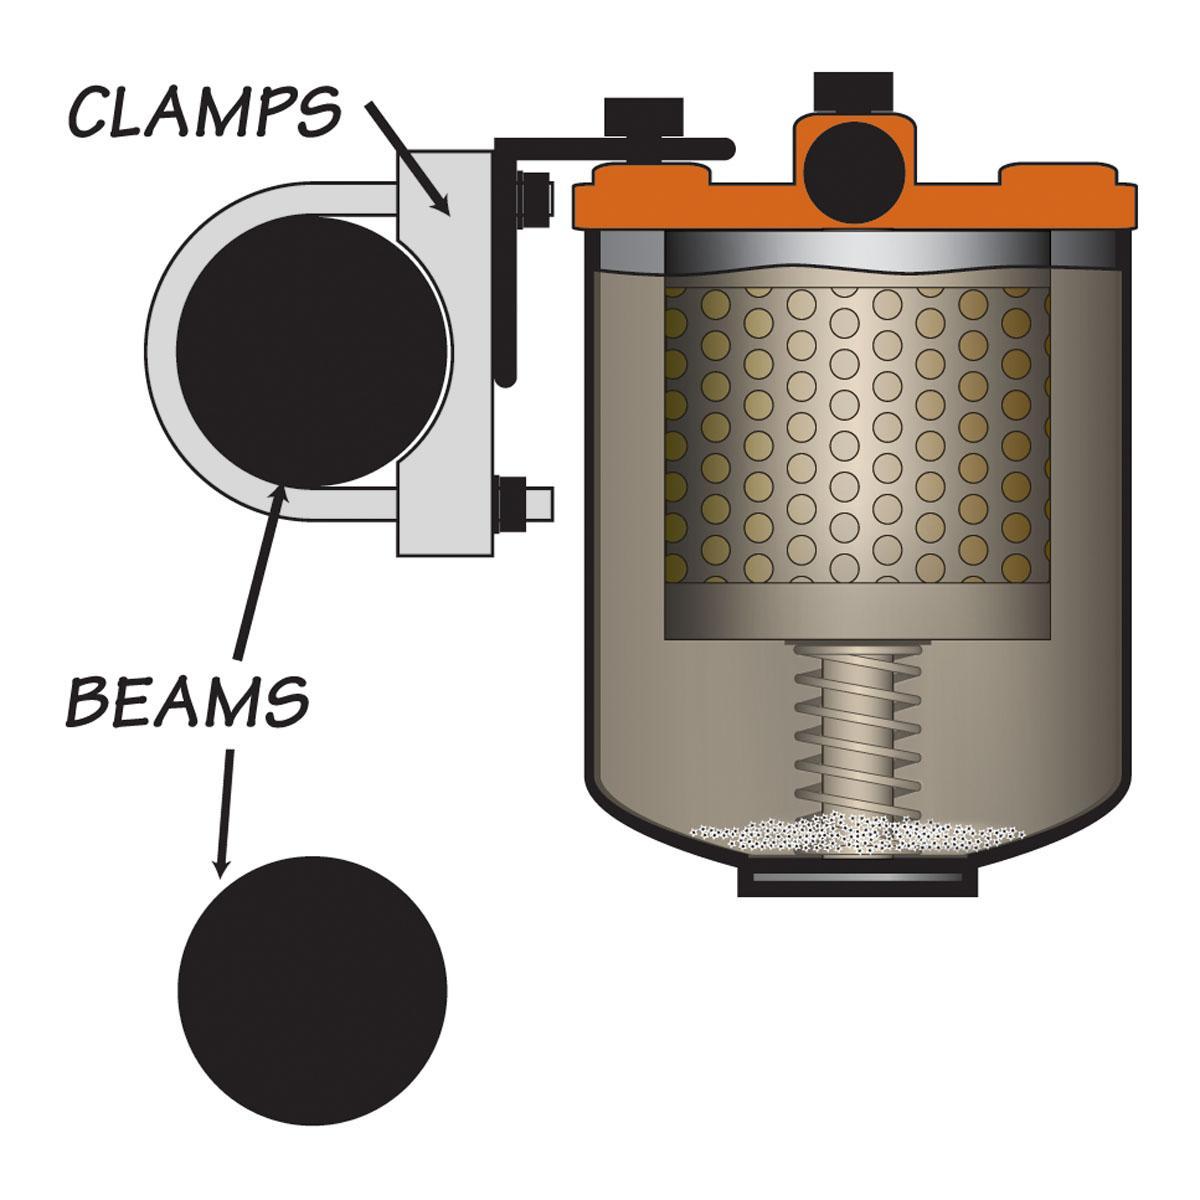 Fran Hpg 1 Fuel Filter Wiring Diagram Libraries Fram Hpgc1 Racing Thesamba Com Gallery Hpg1 Mounted On Beam